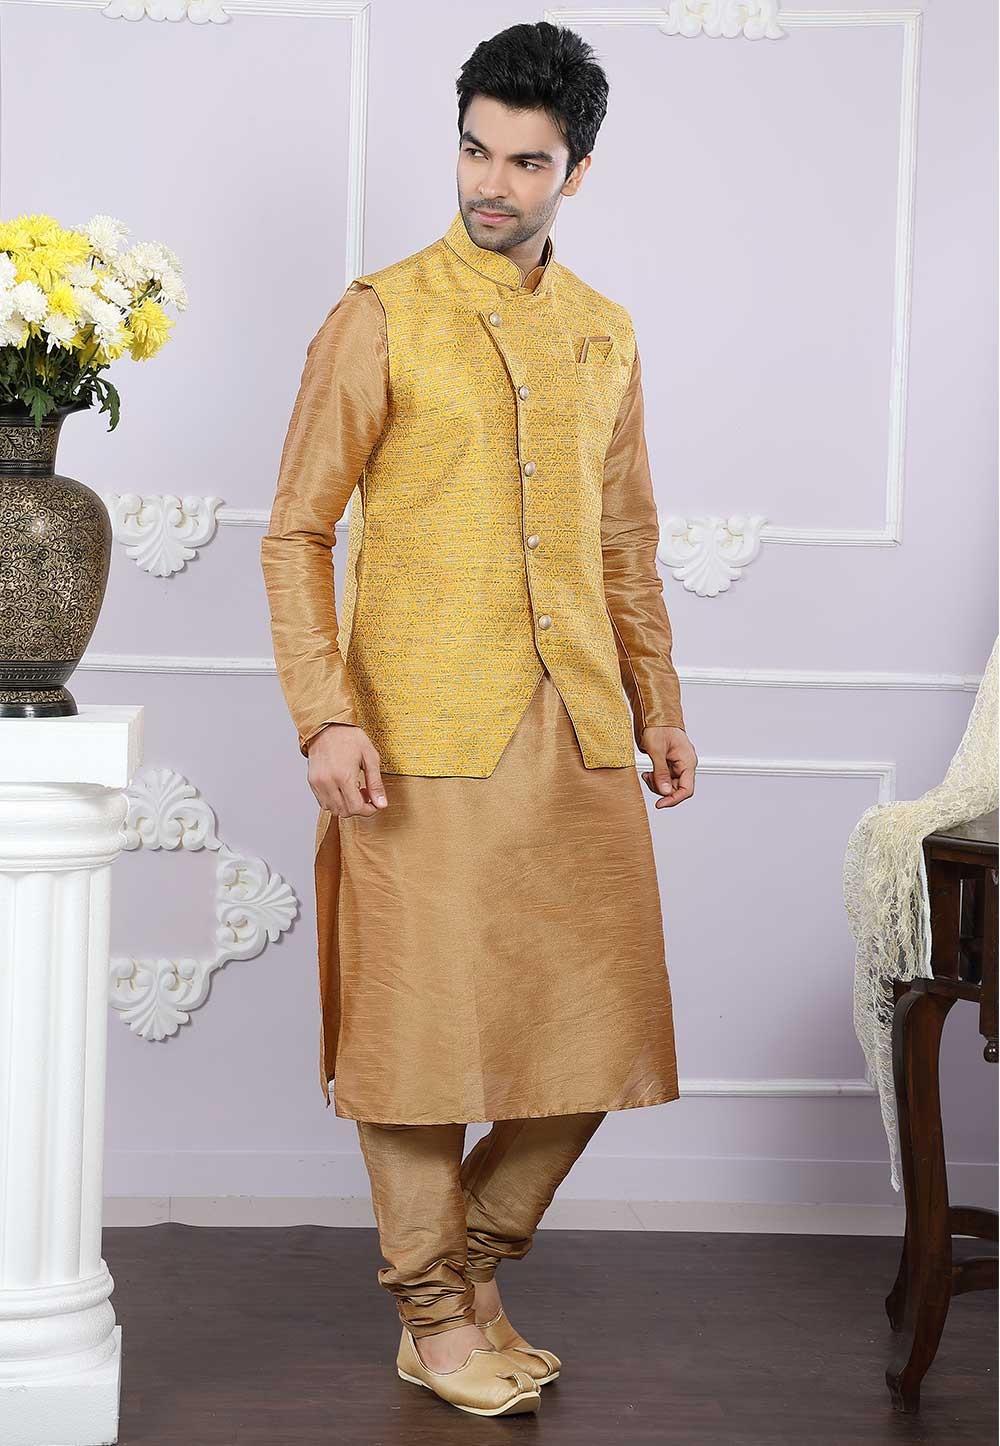 Buy designer kurta pajama in beige, yellow colour